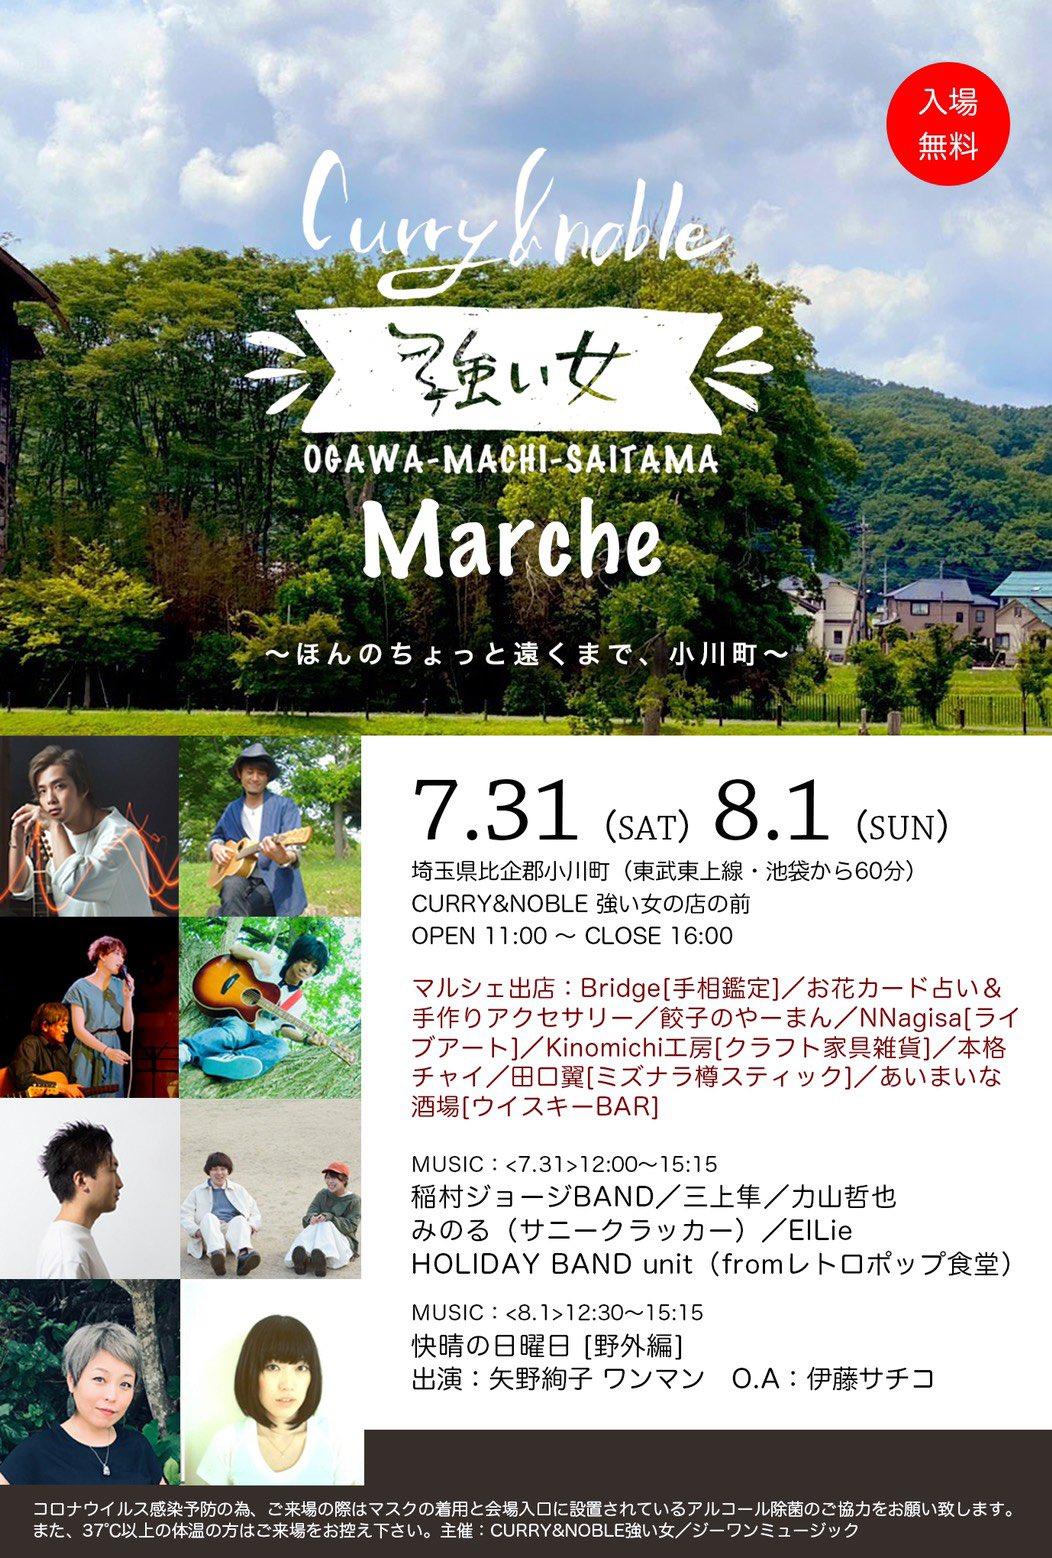 Curry&noble 強い女 OGAWA-MACHI-SAITAMA Marche